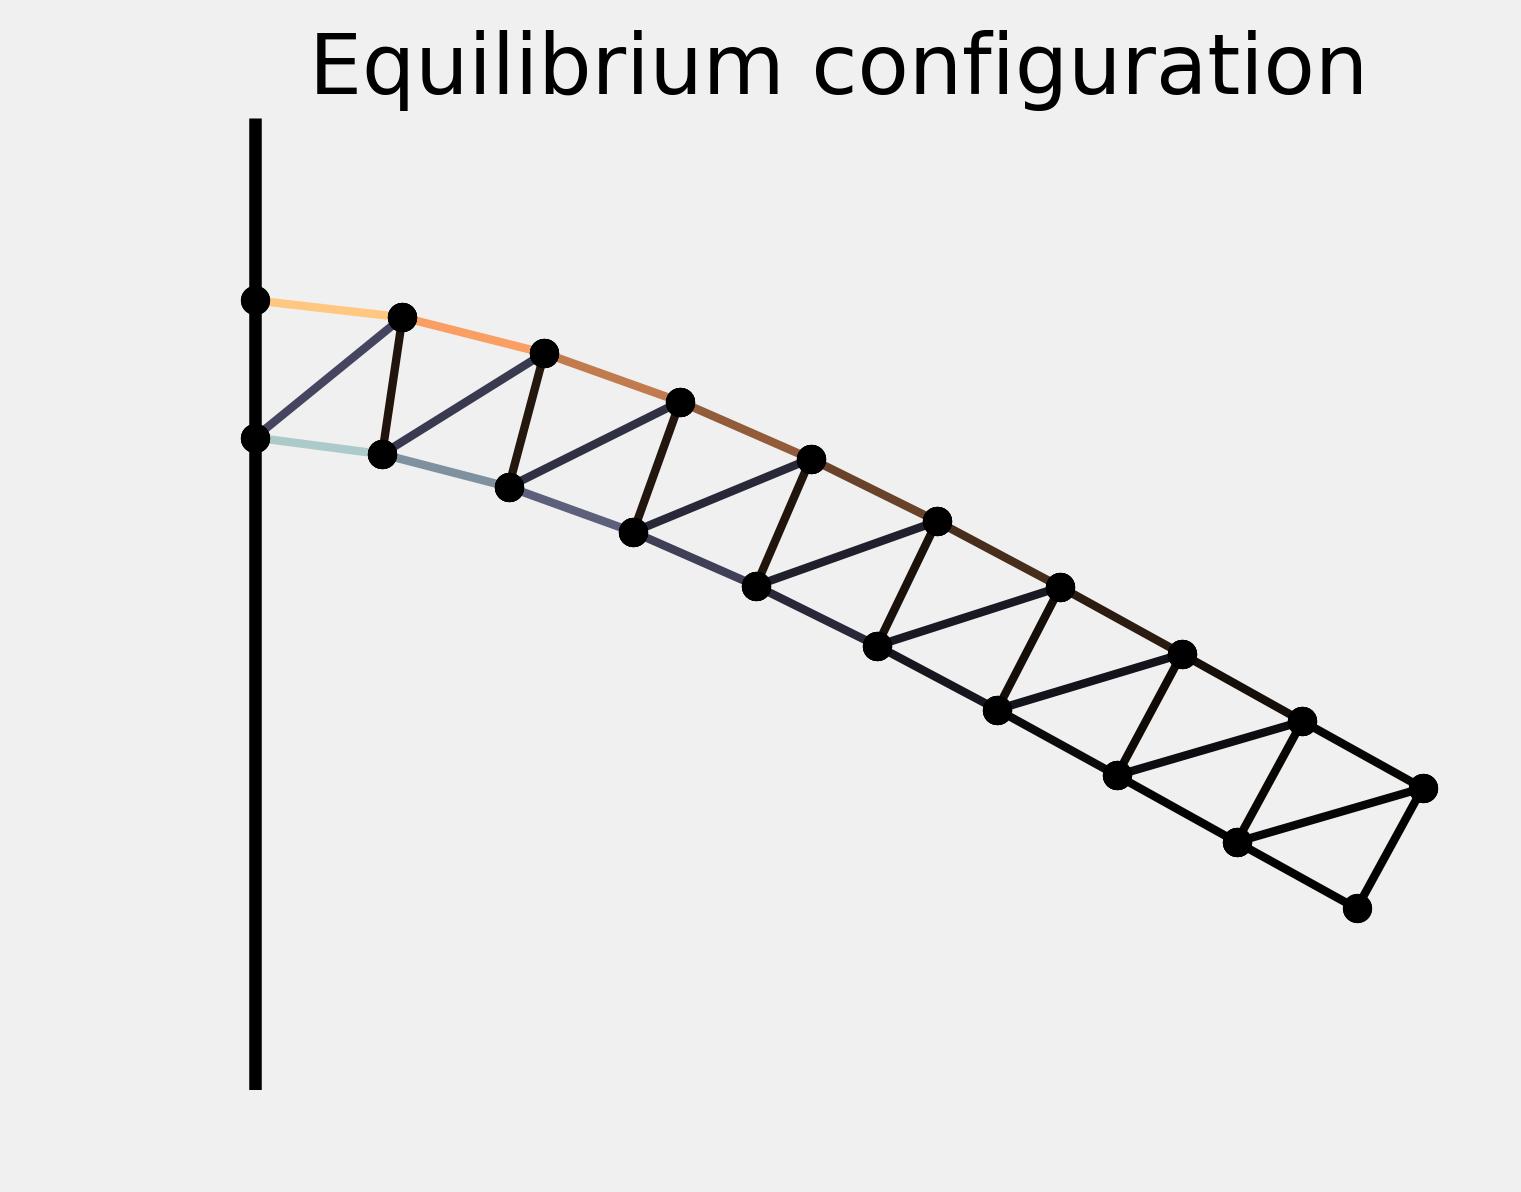 <matplotlib.figure.Figure at 0x74b6ef0>